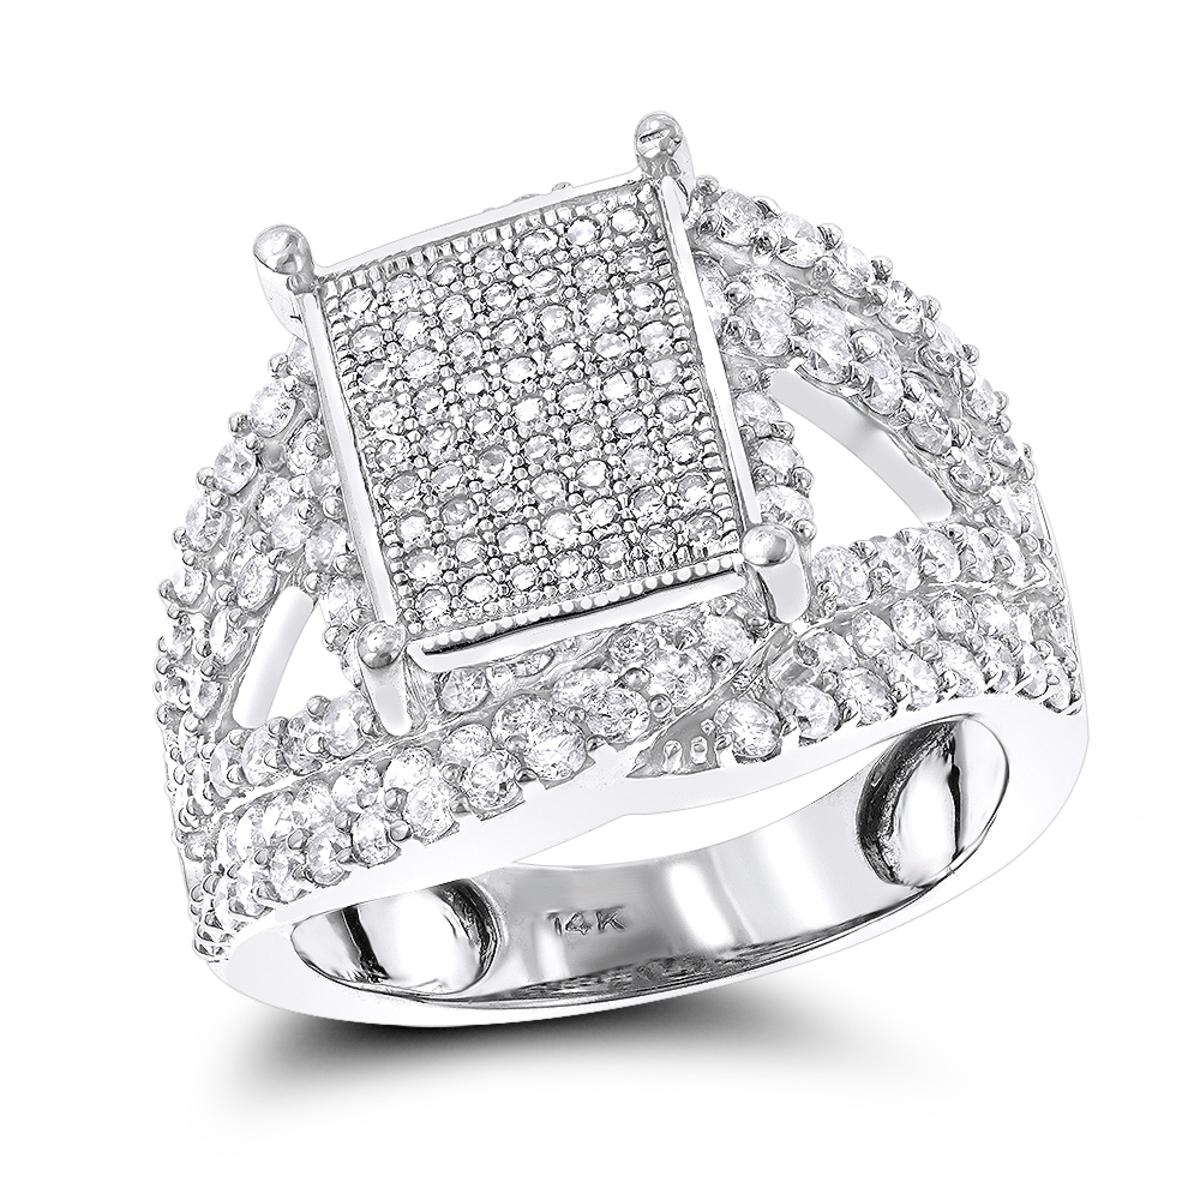 Ladies Diamond Engagement Ring 14K 1.5 ct